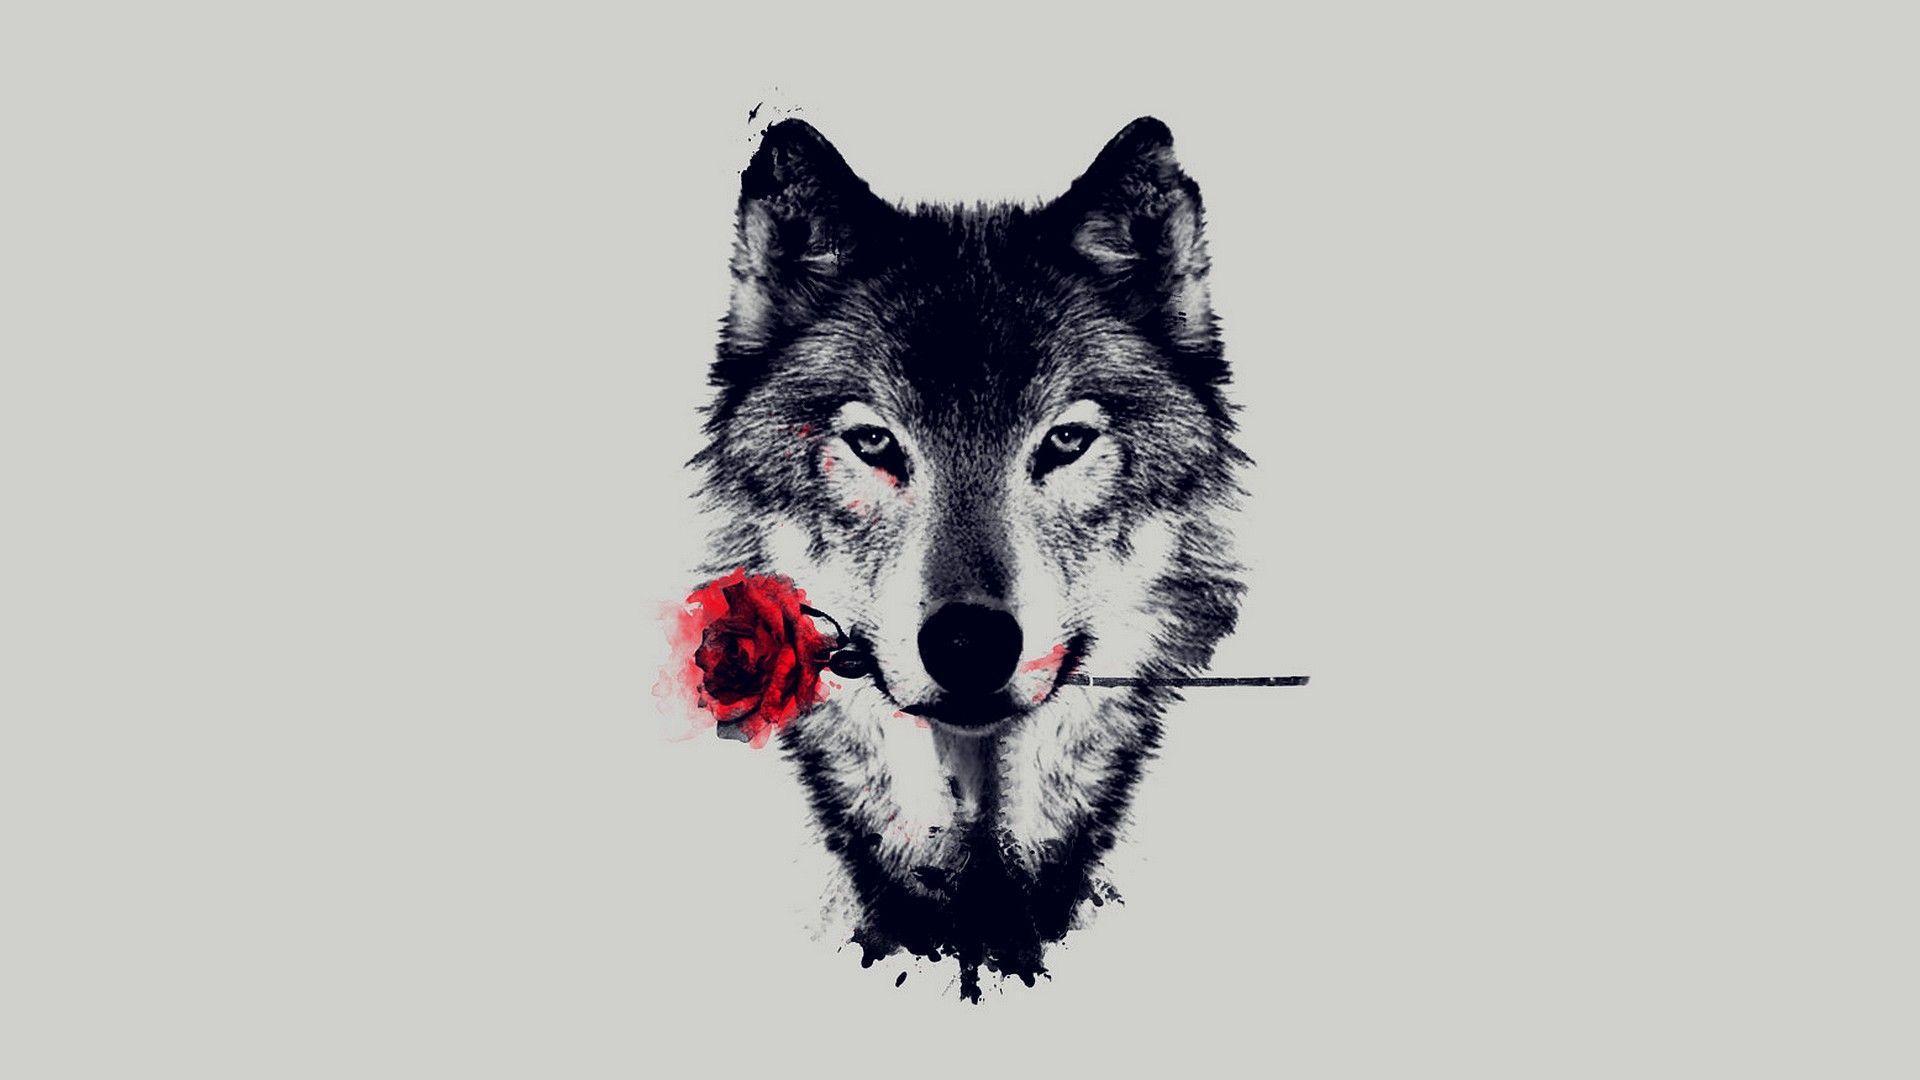 Wolf Art Wallpapers Top Free Wolf Art Backgrounds Wallpaperaccess